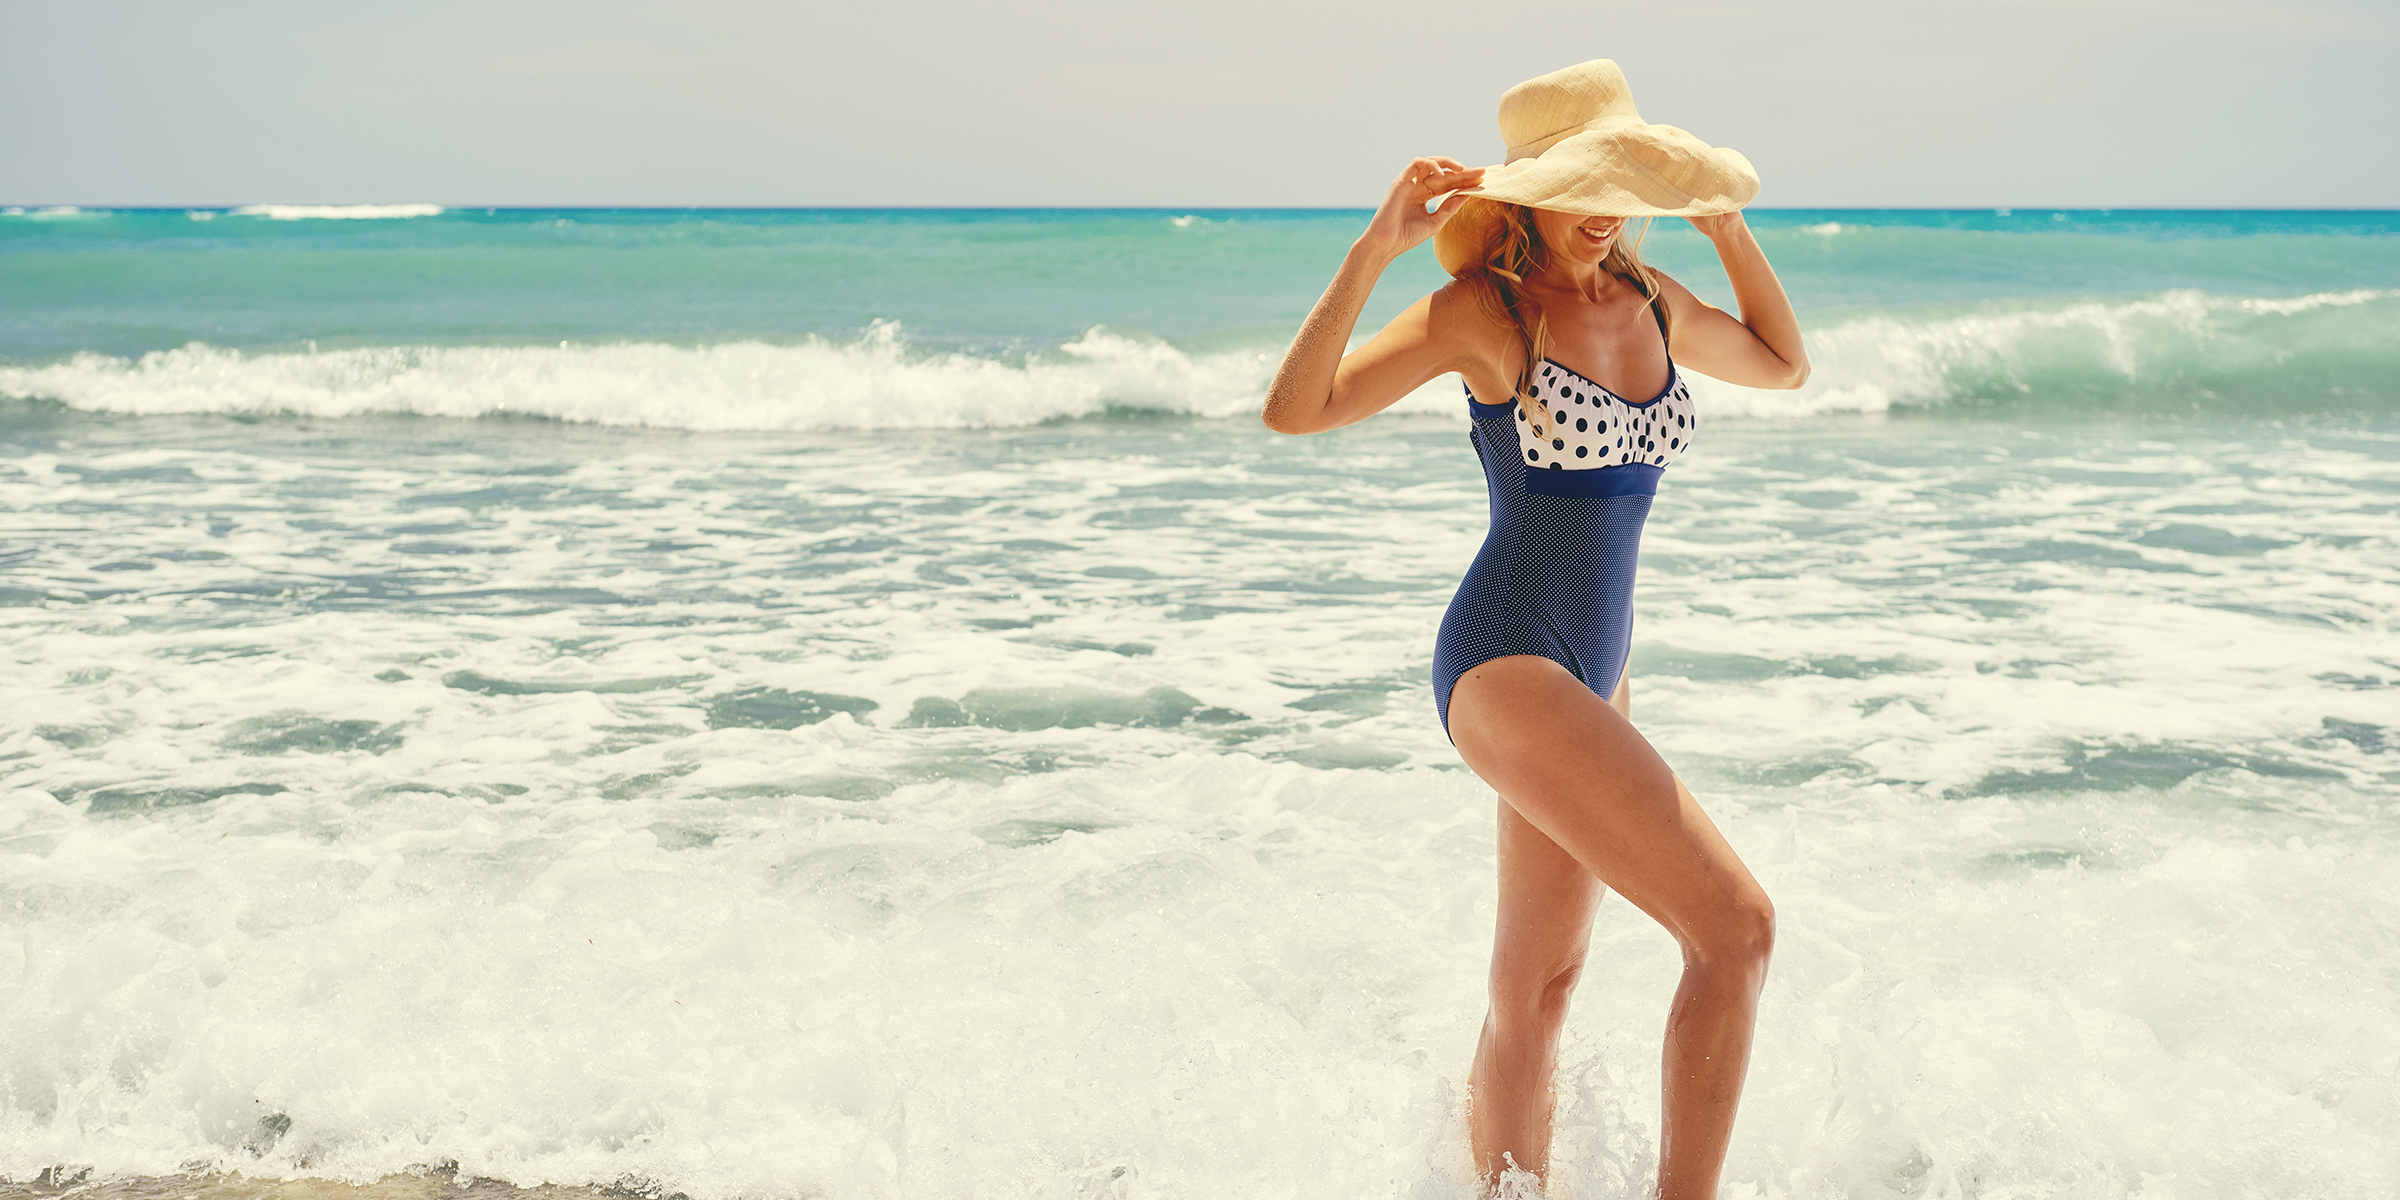 selena gomez bikini gallery